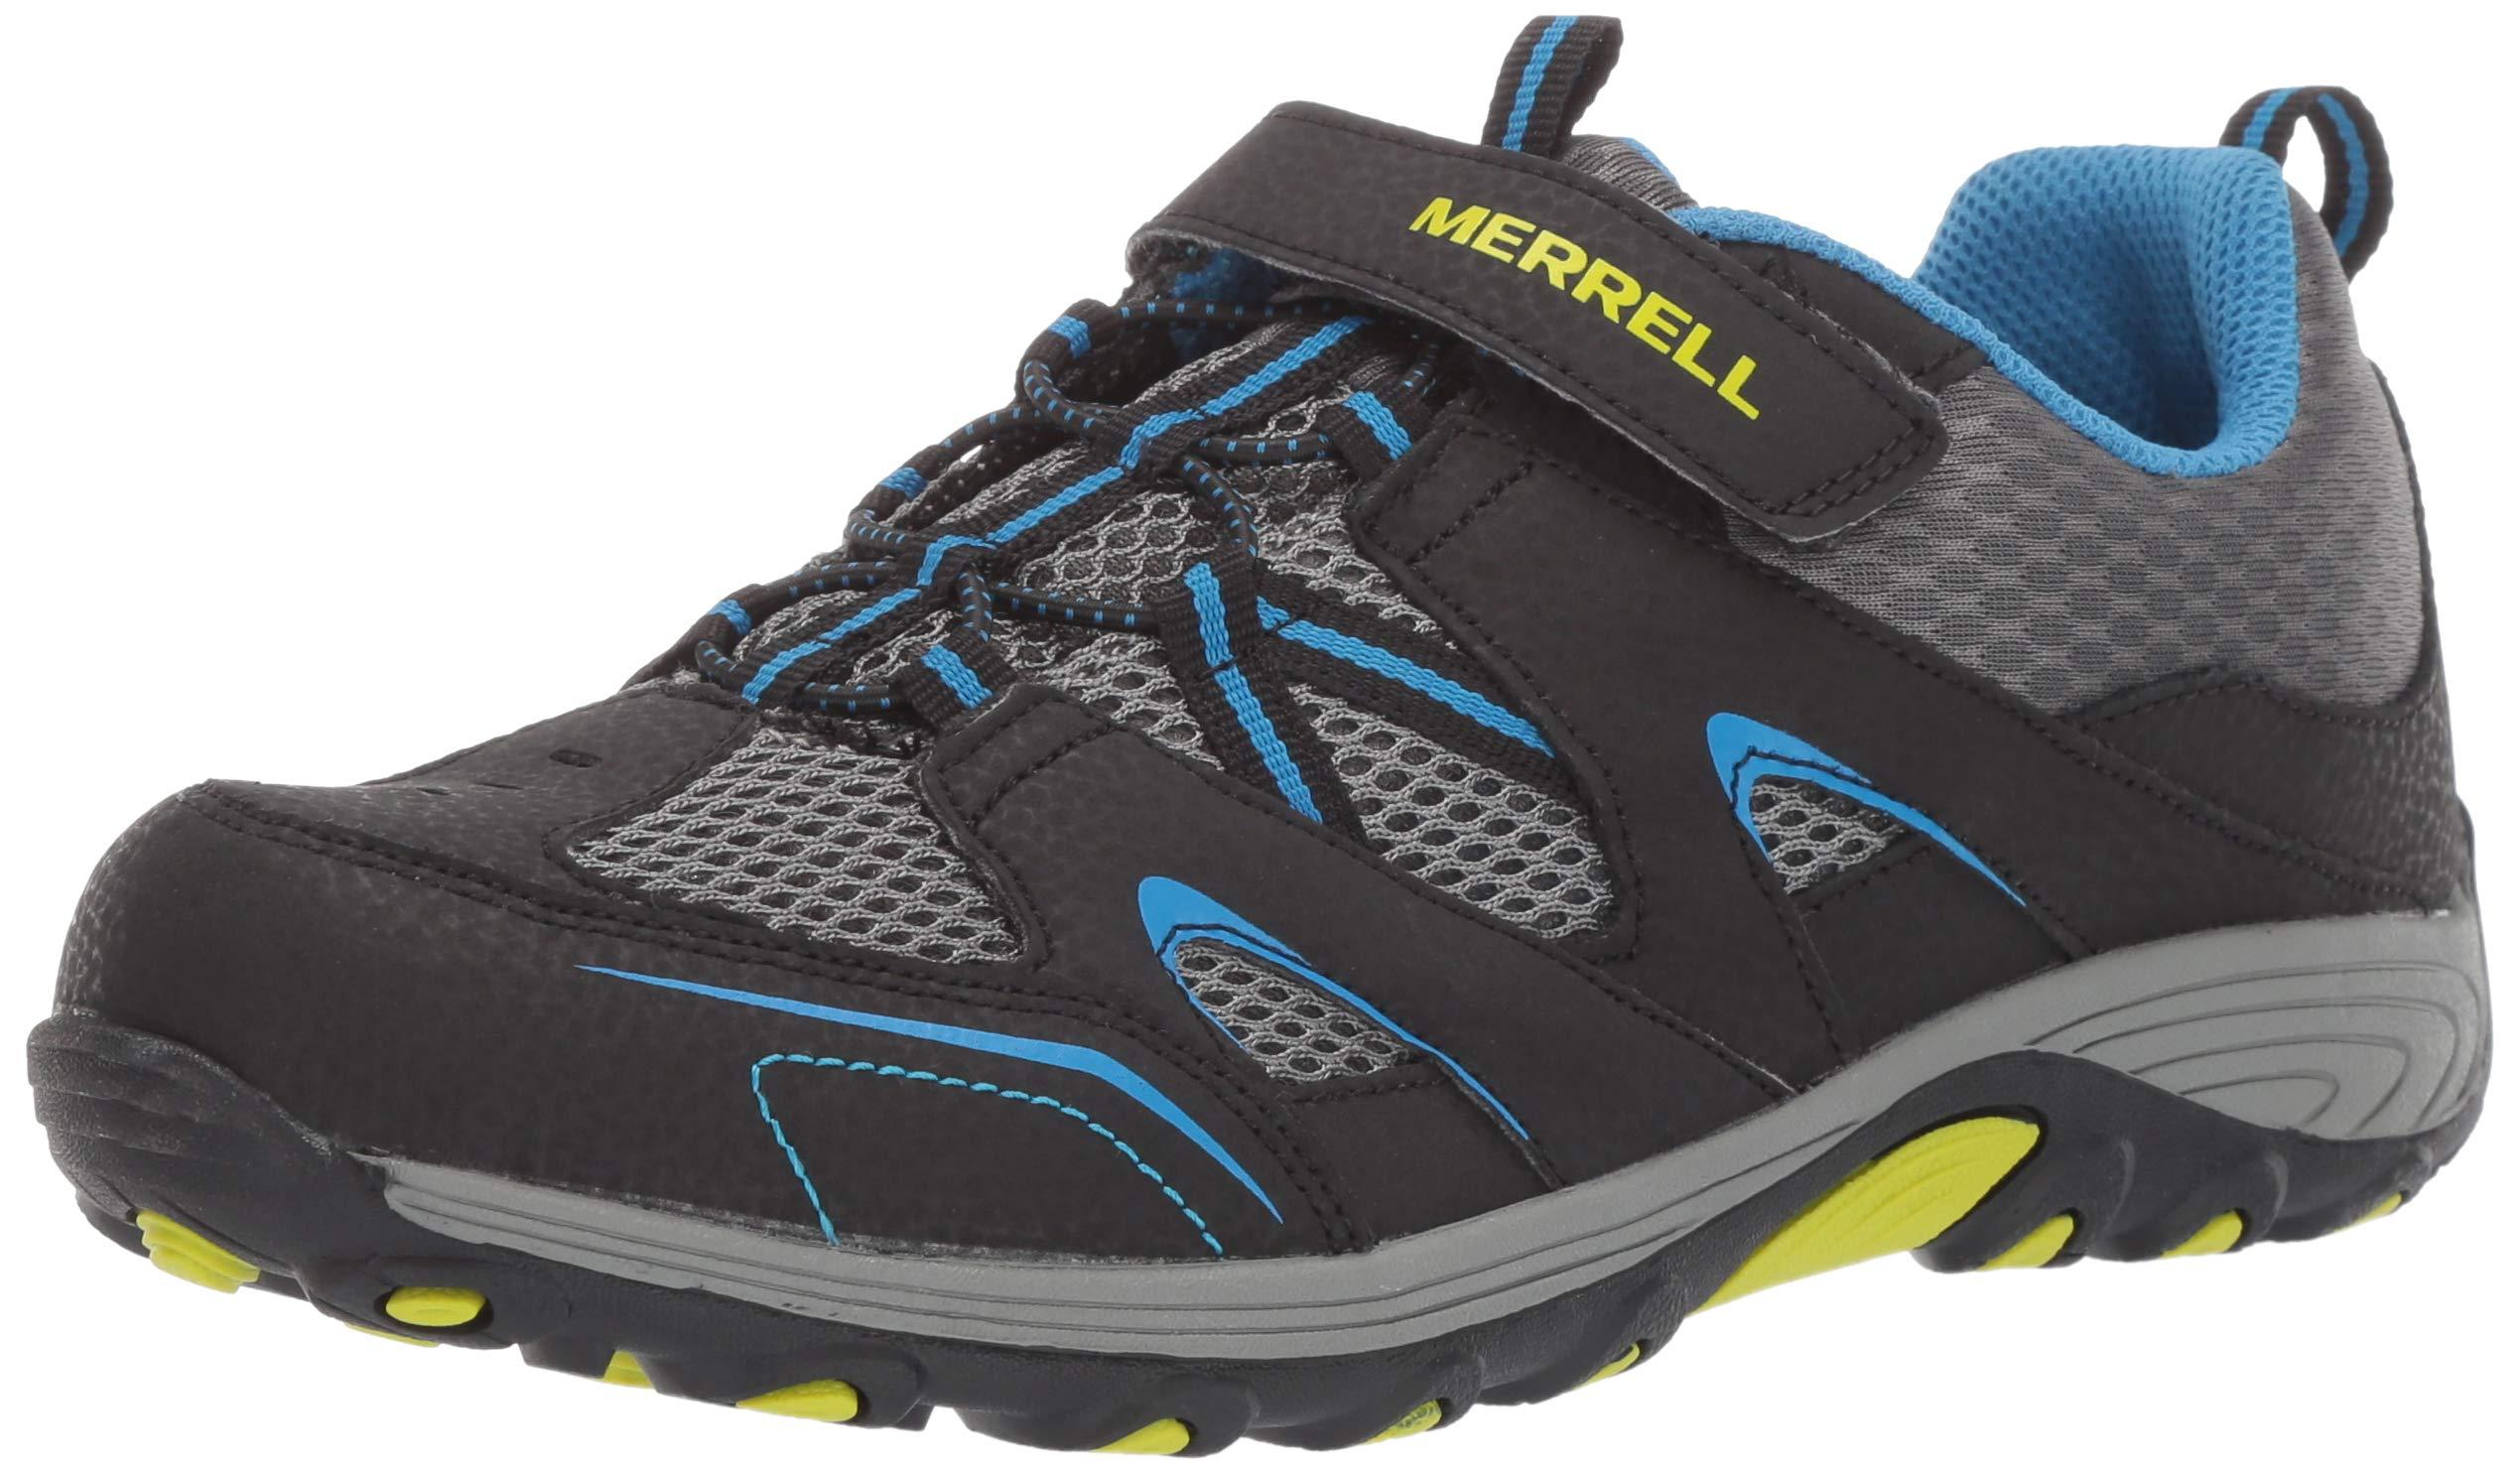 Merrell Boys' Trail Chaser Sneaker Black/Blue 5.5 Wide US Big Kid